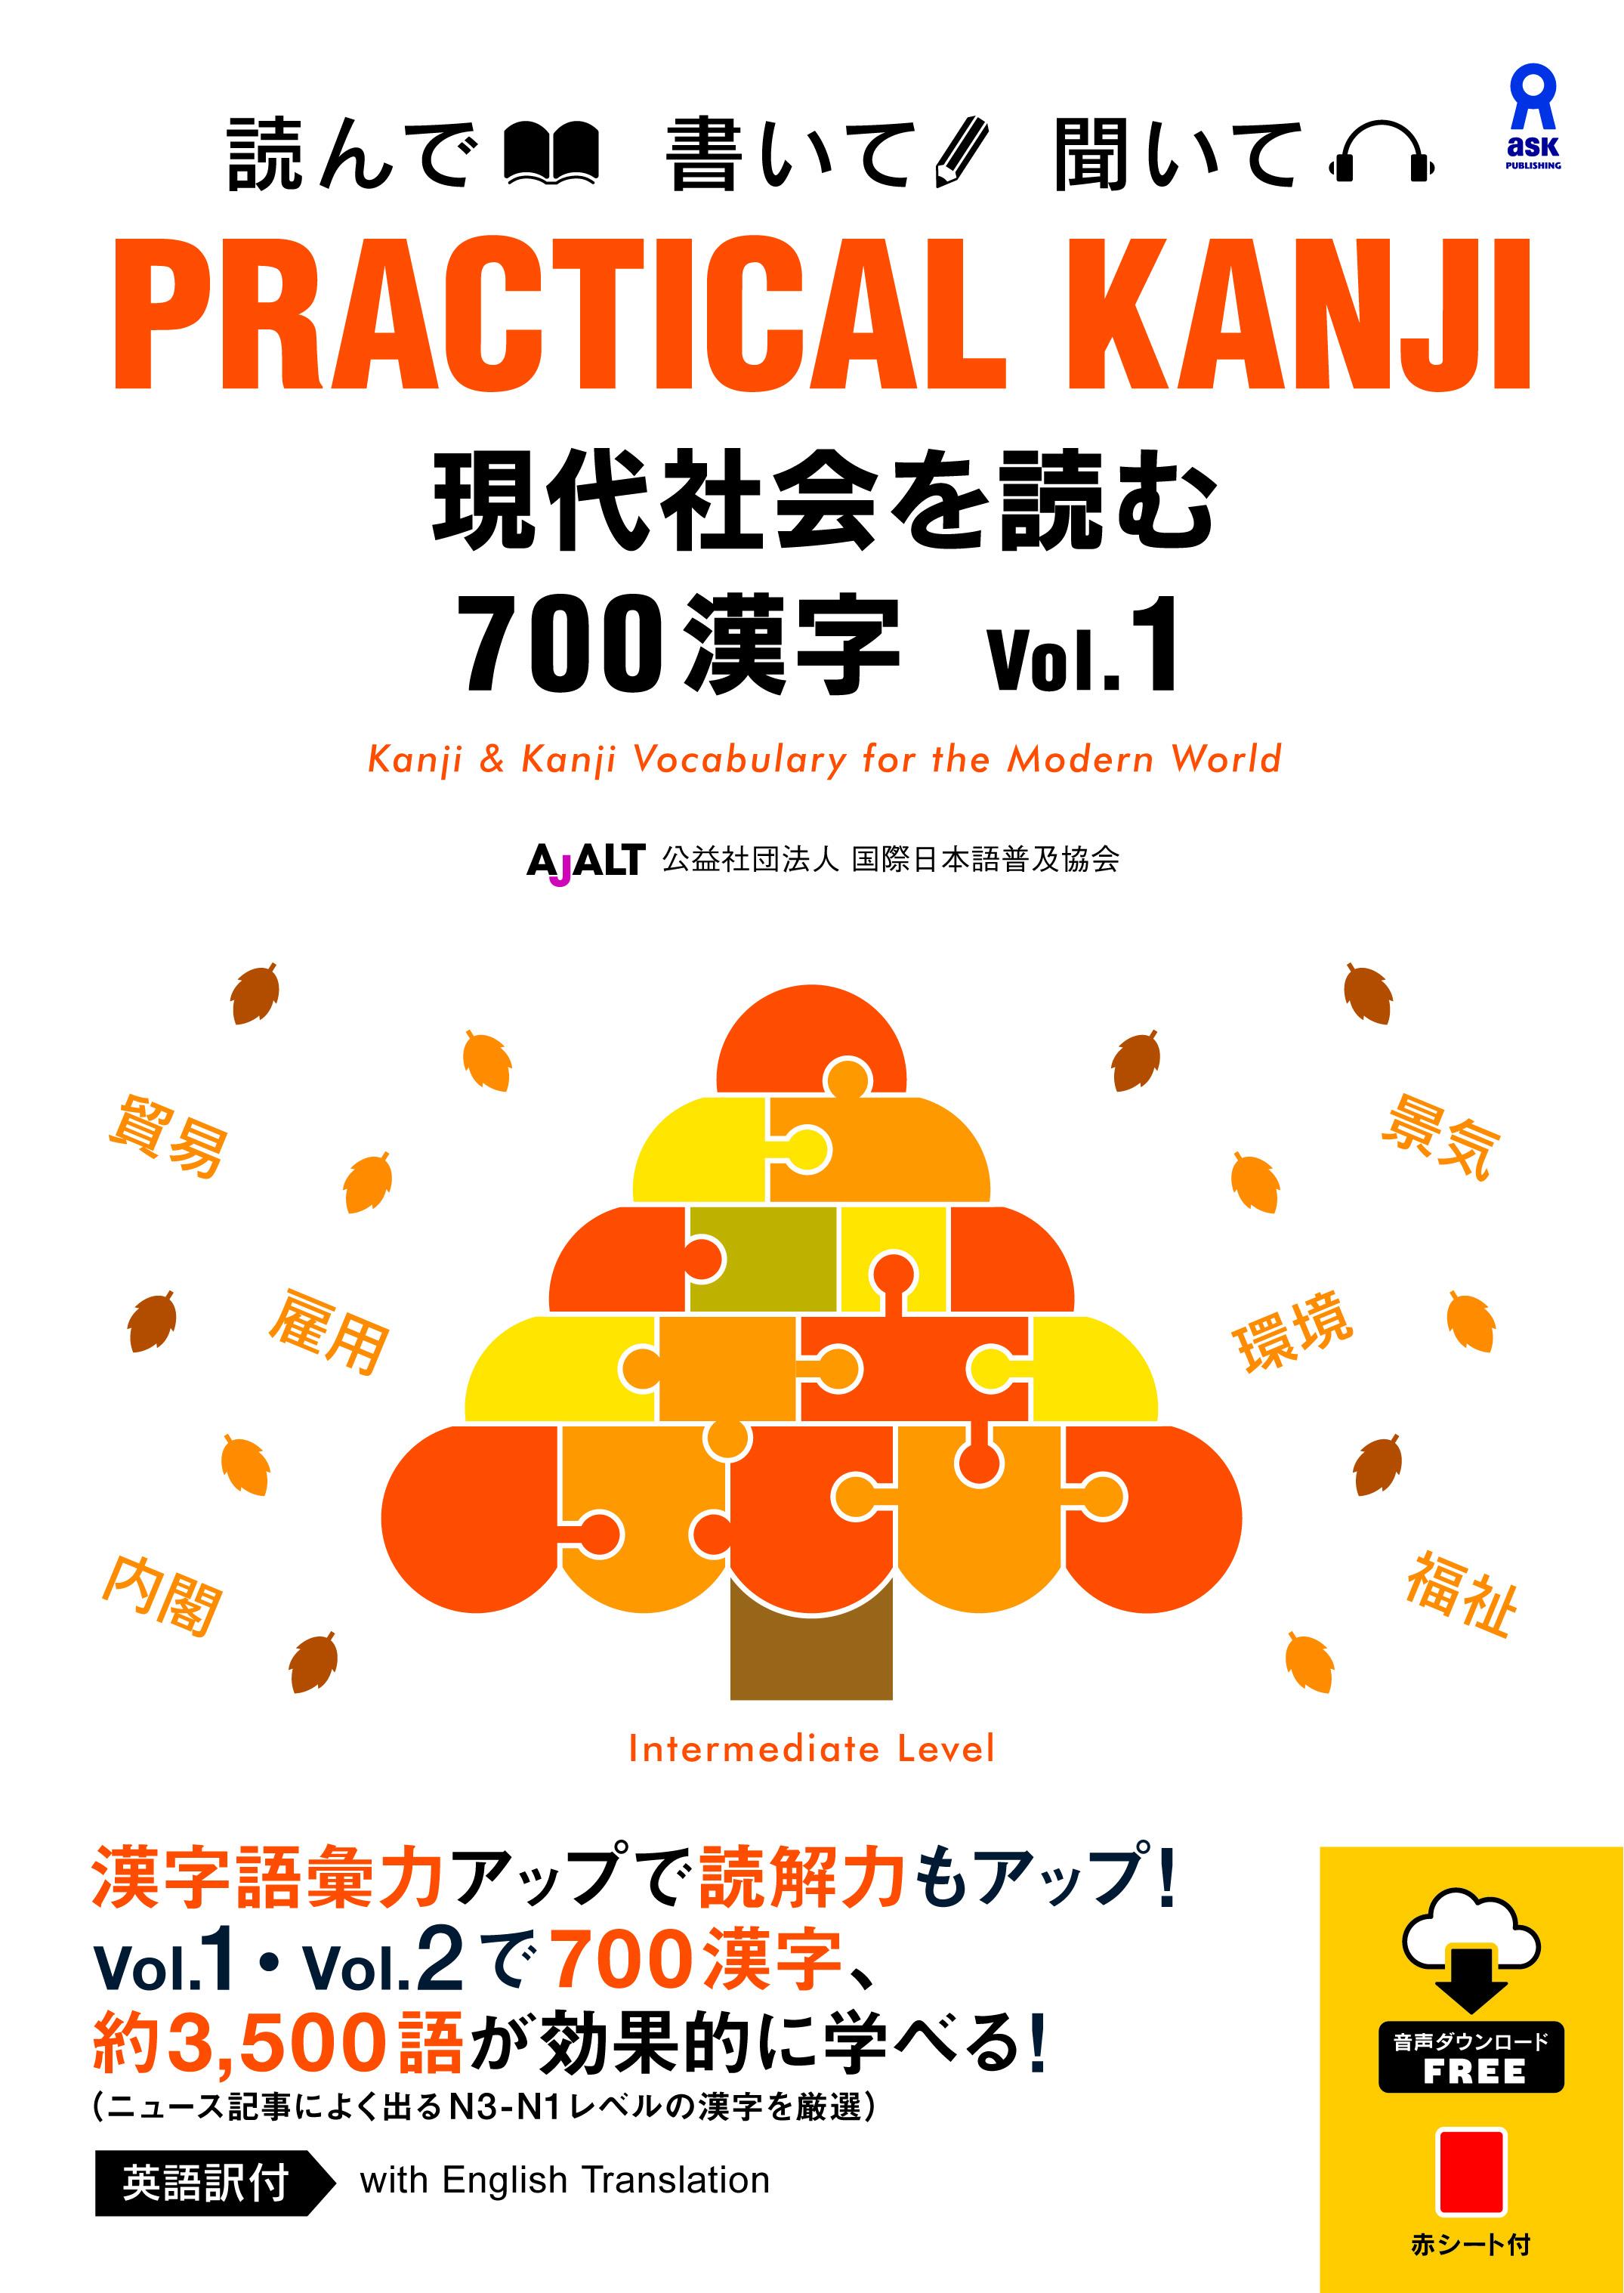 PRACTICAL KANJI 現代社会を読む700漢字 Vol. 1画像